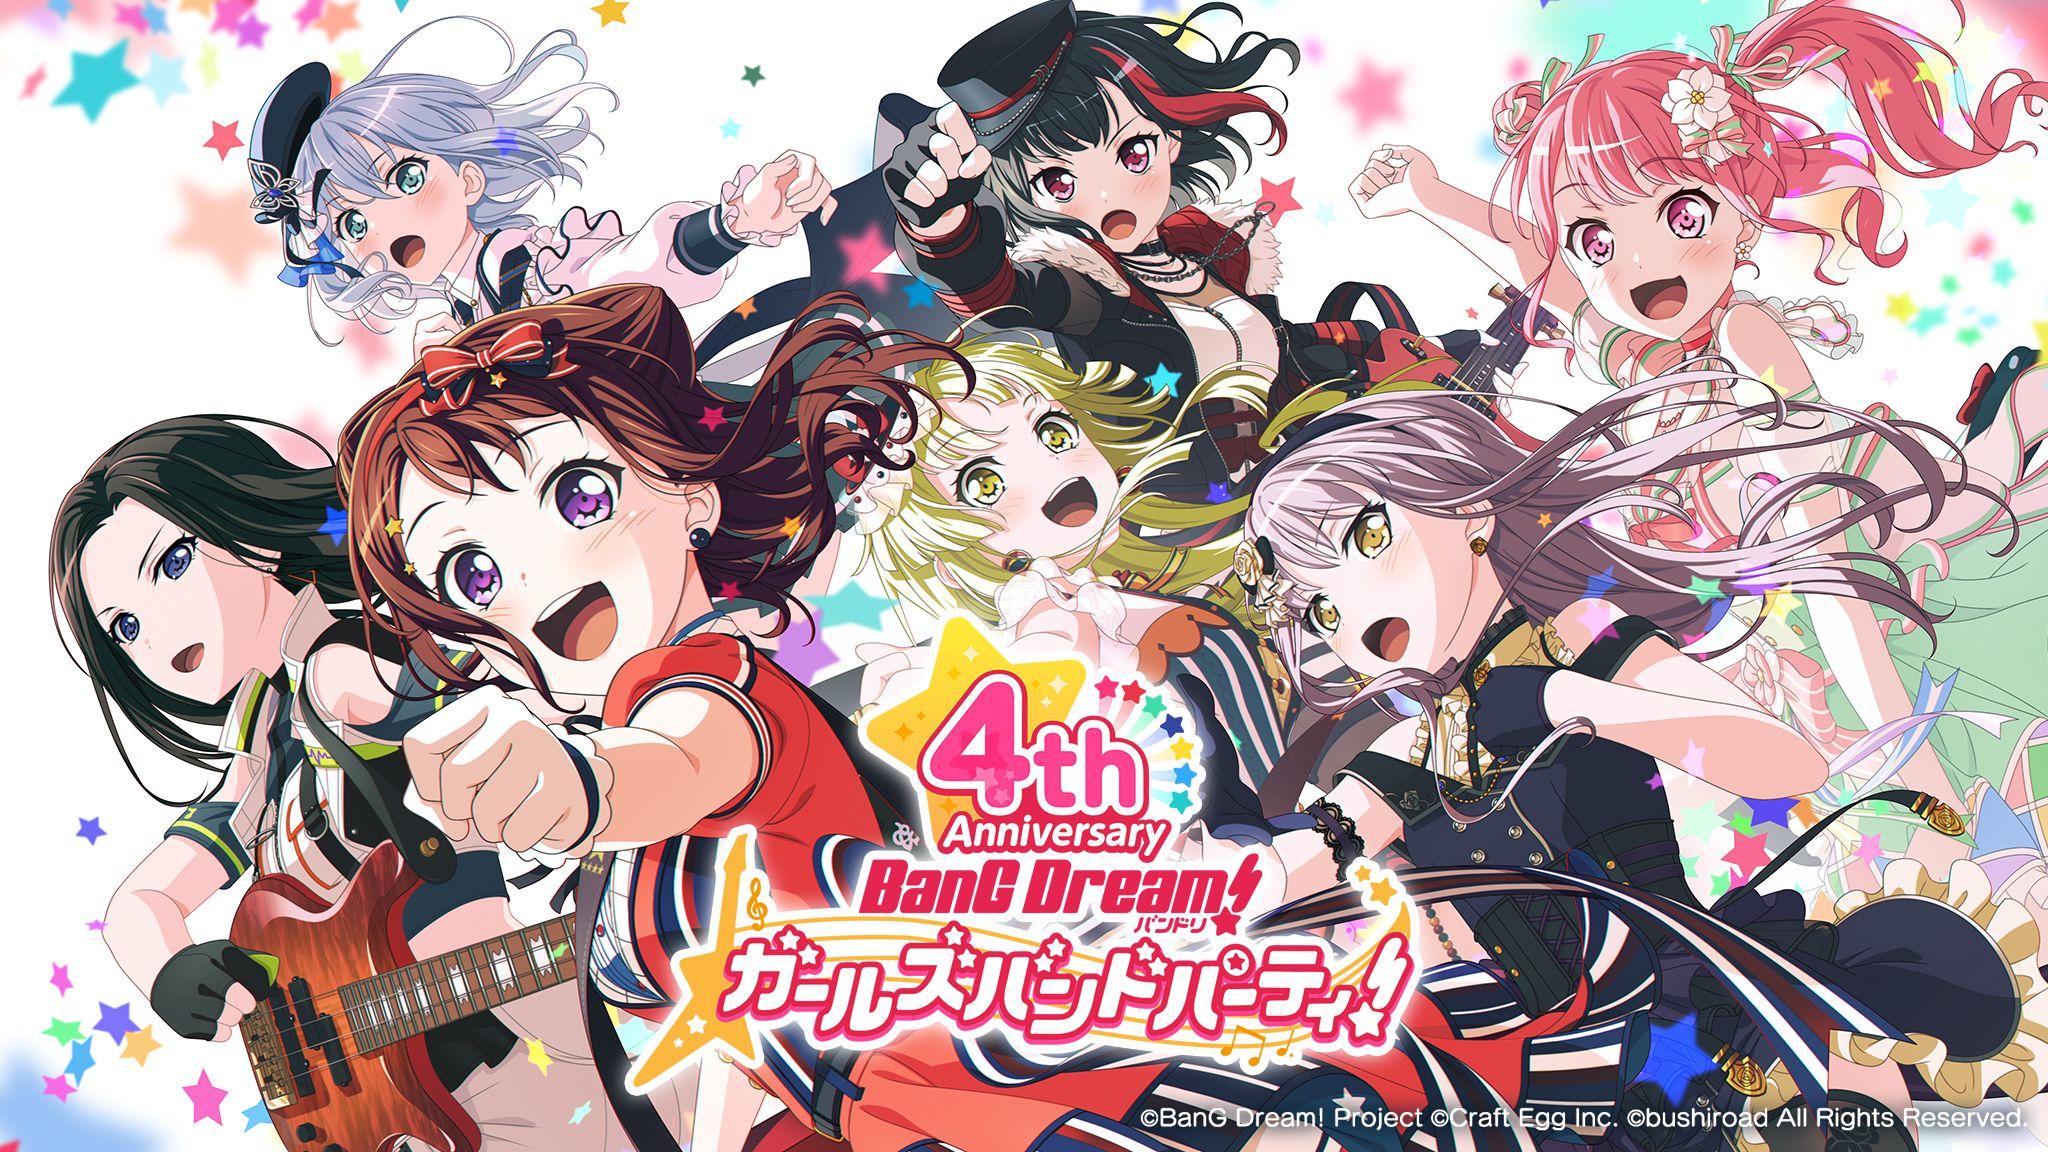 BanG Dream!少女乐团派对!(日服) 游戏截图1